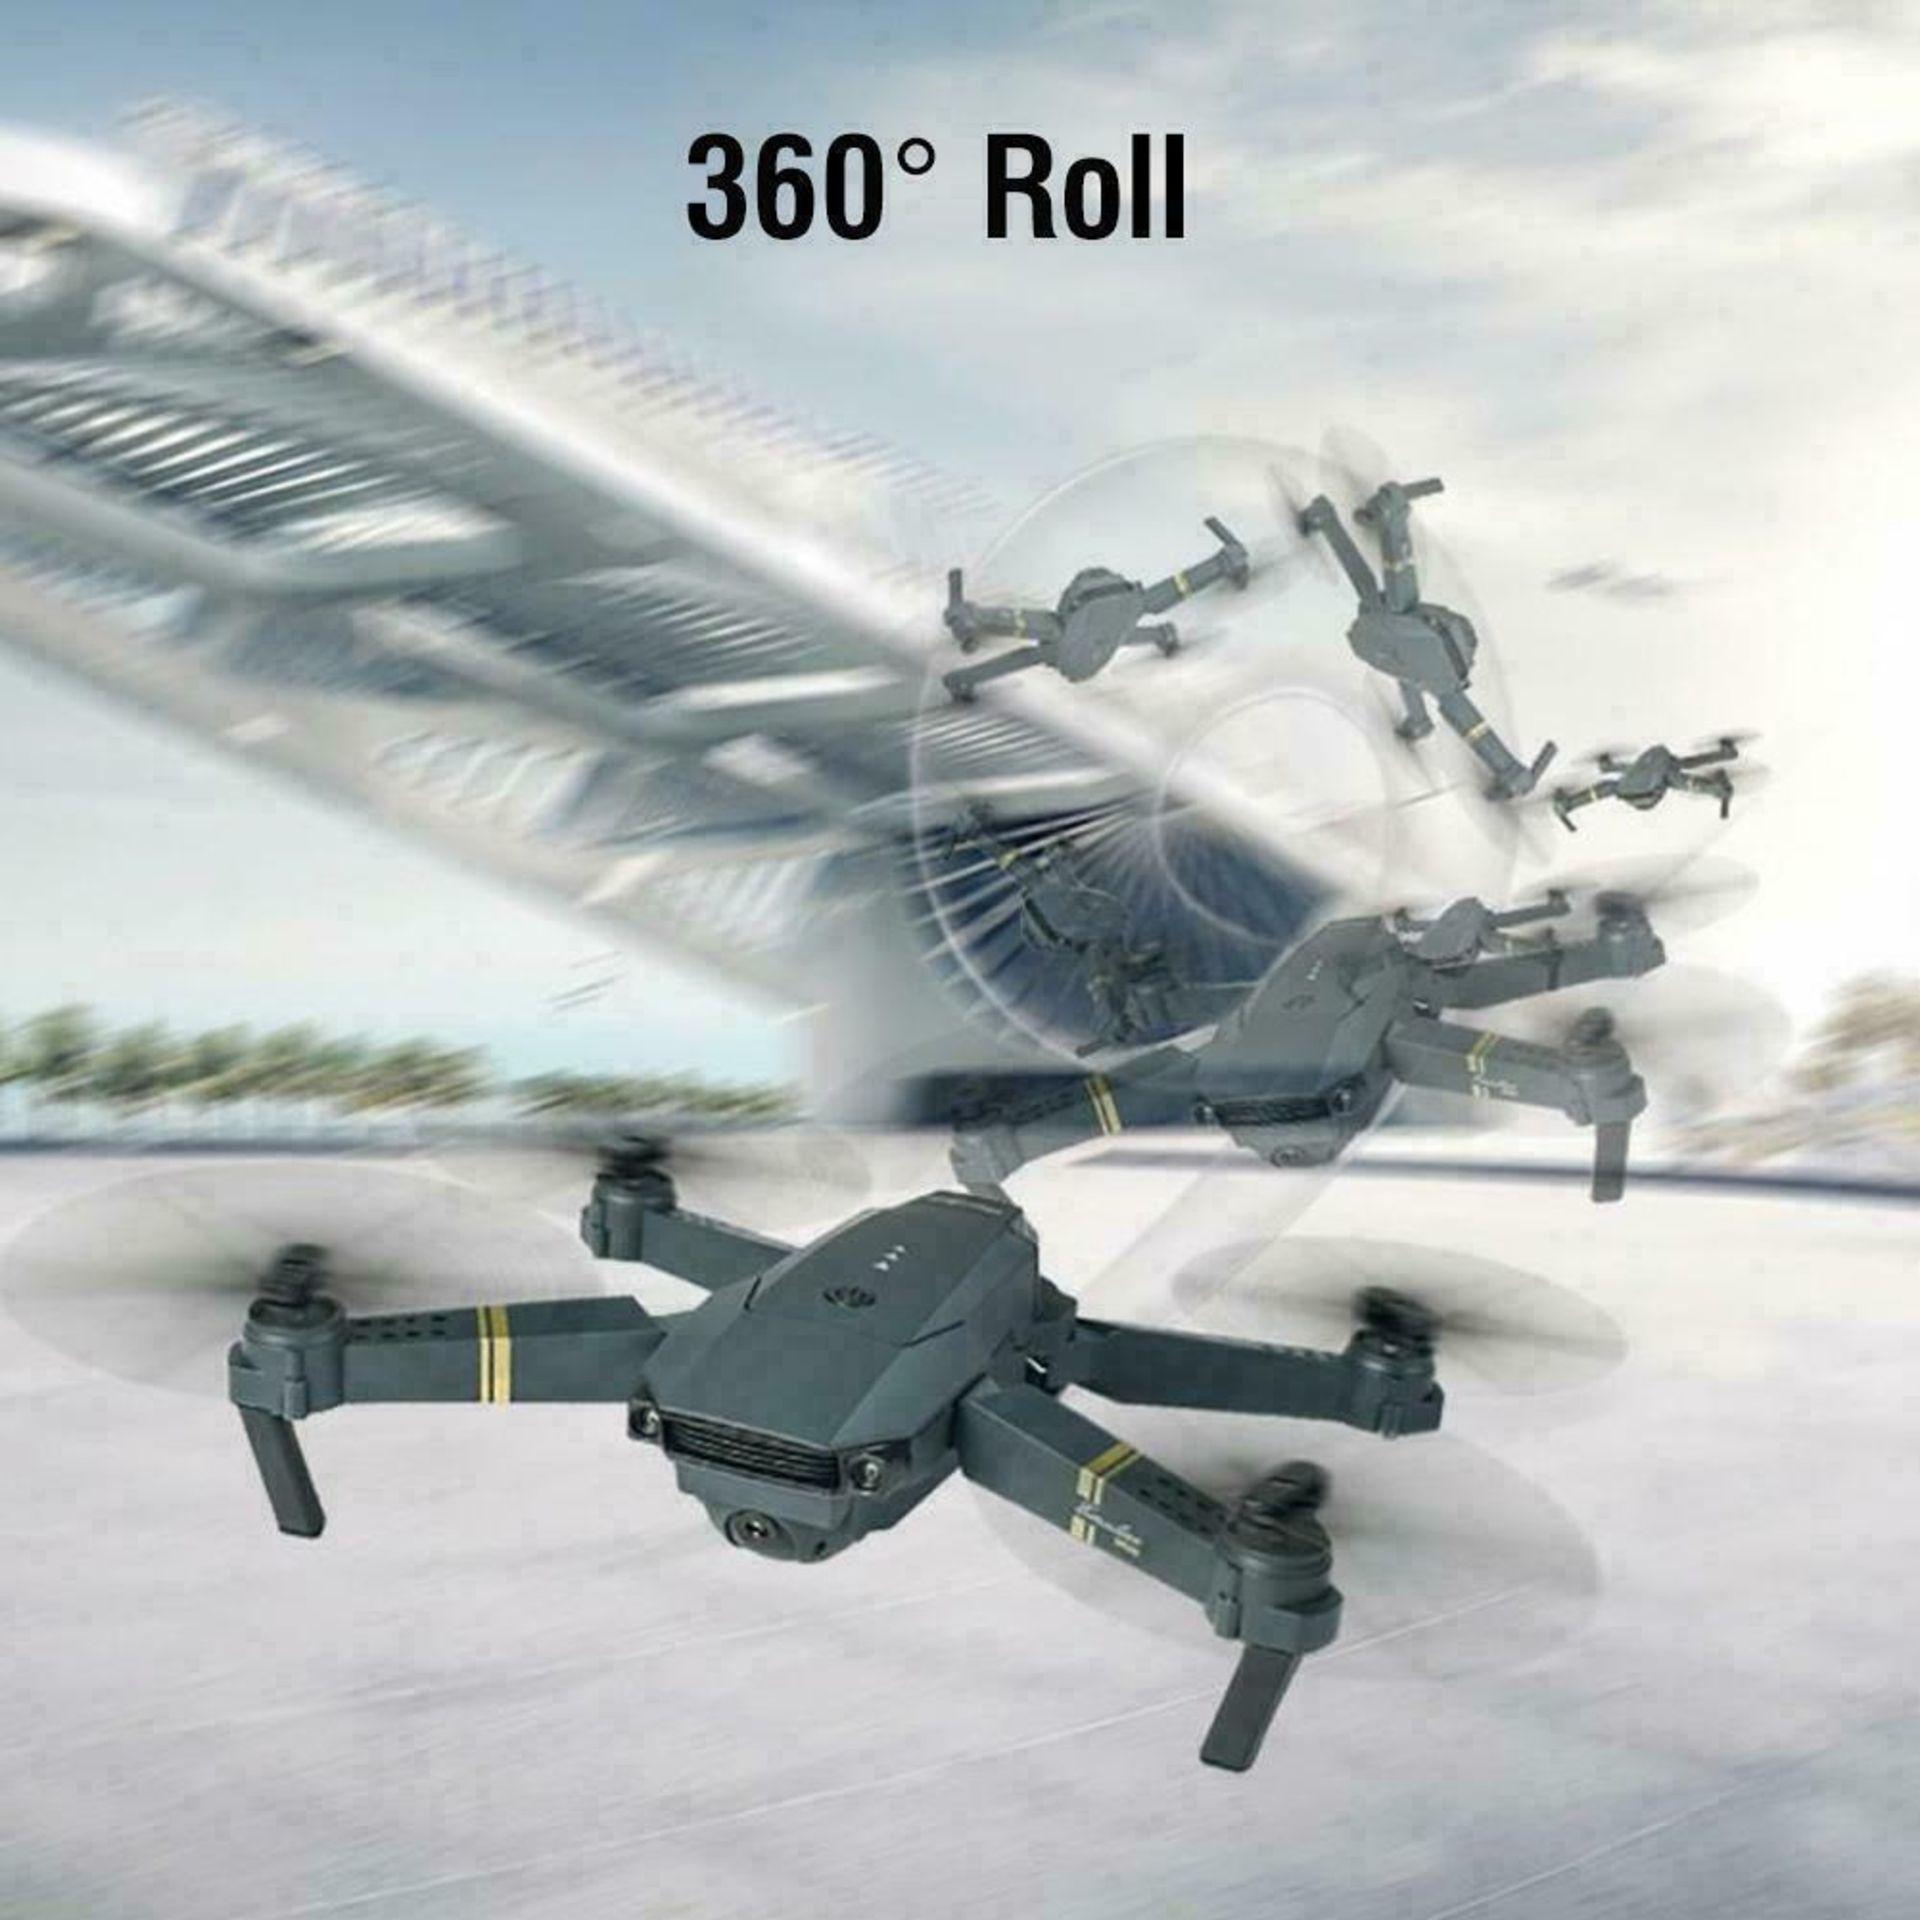 NEW & UNUSED DRONE X PRO WIFI FPV 1080P HD CAMERA FOLDABLE RC QUADCOPTER + BAG *PLUS VAT* - Image 9 of 9